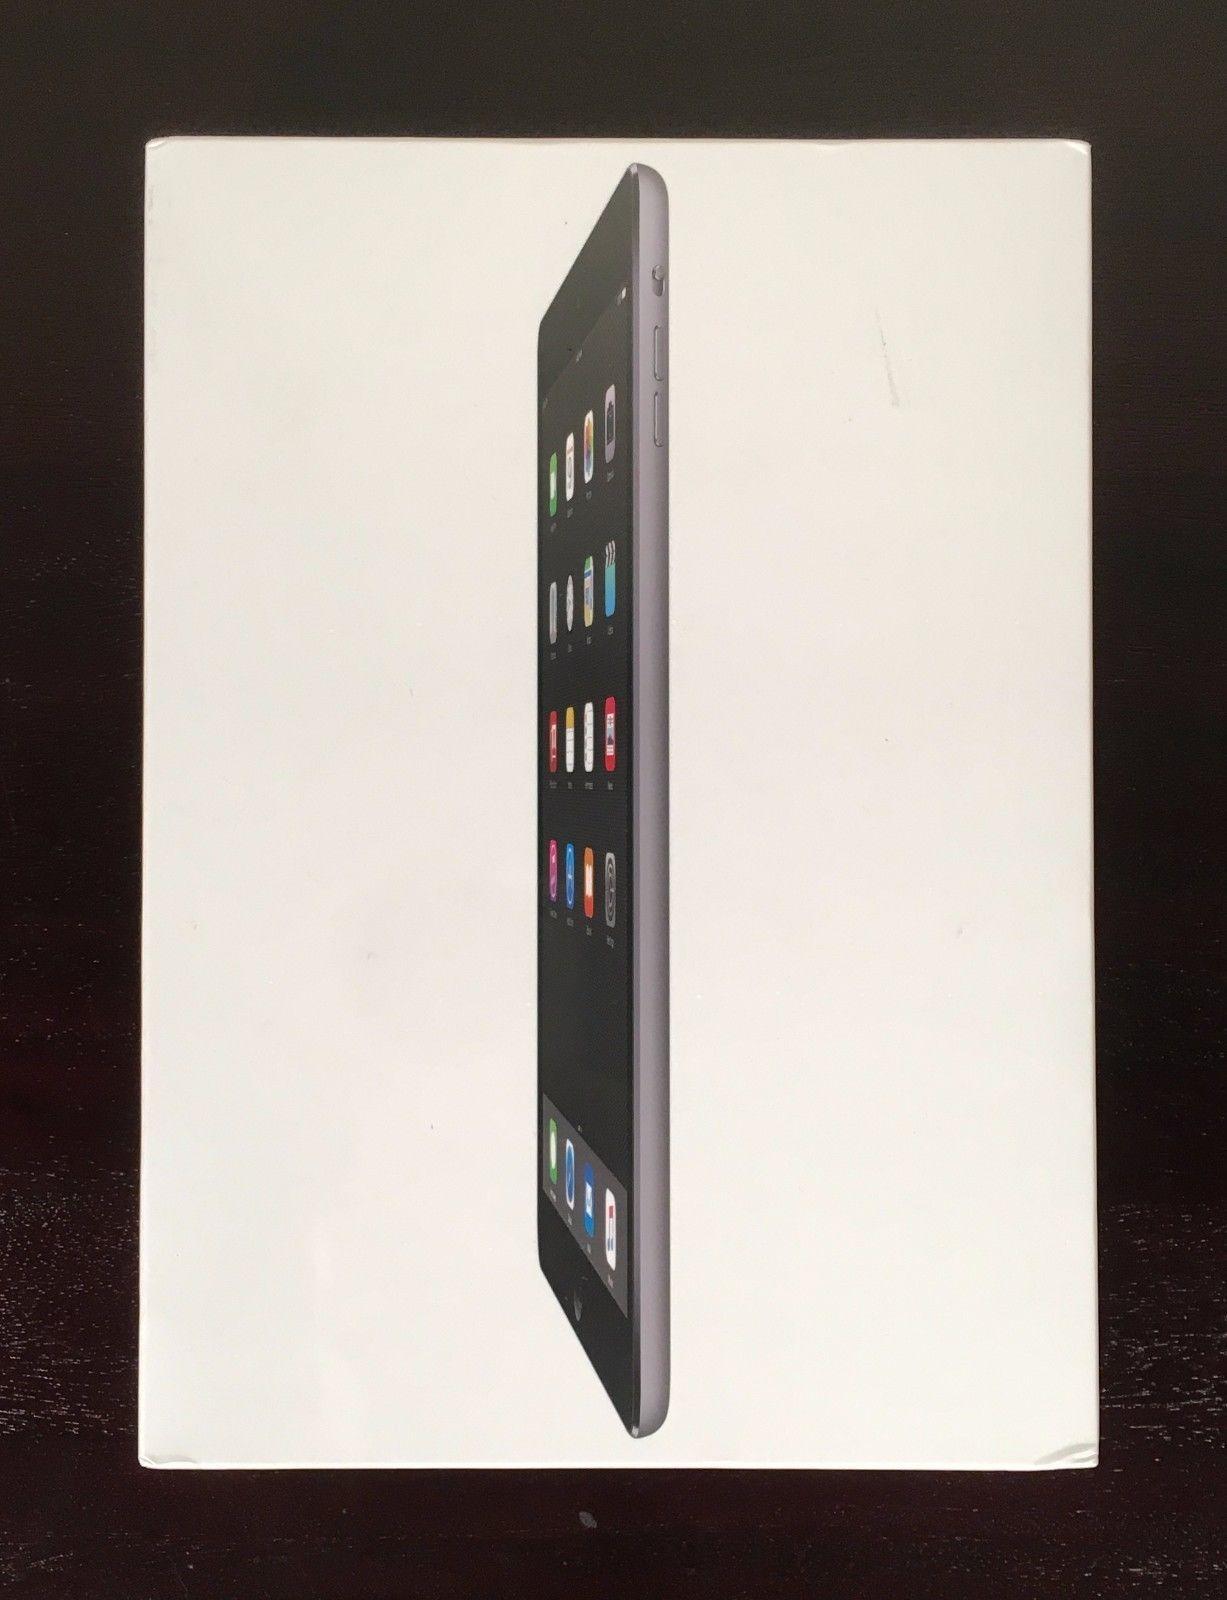 NEW Sealed Apple iPad Air MD785LL/B 9.7-Inch 16GB Wi-Fi Tablet Space Gray